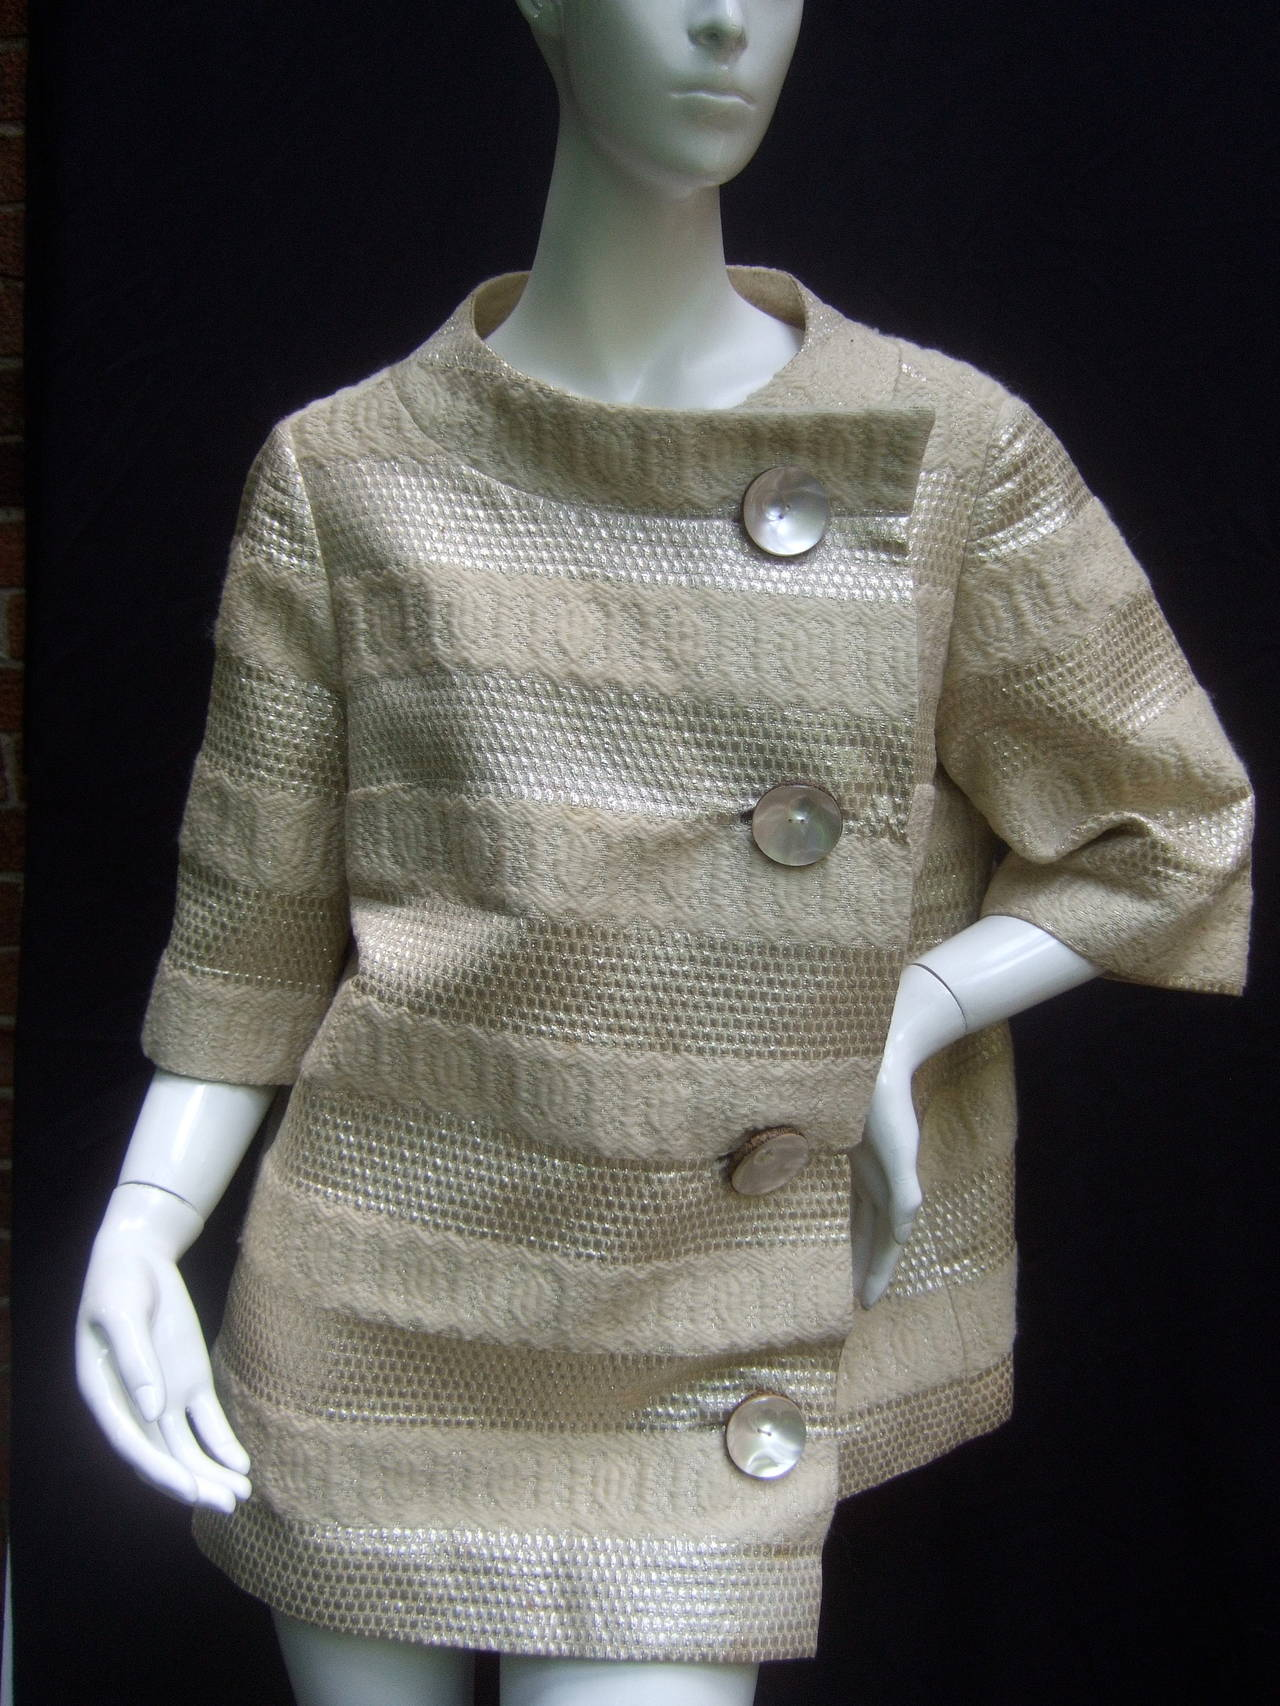 Harrods Metallic Knit Silk Brocade Evening Jacket c 1960 at 1stdibs